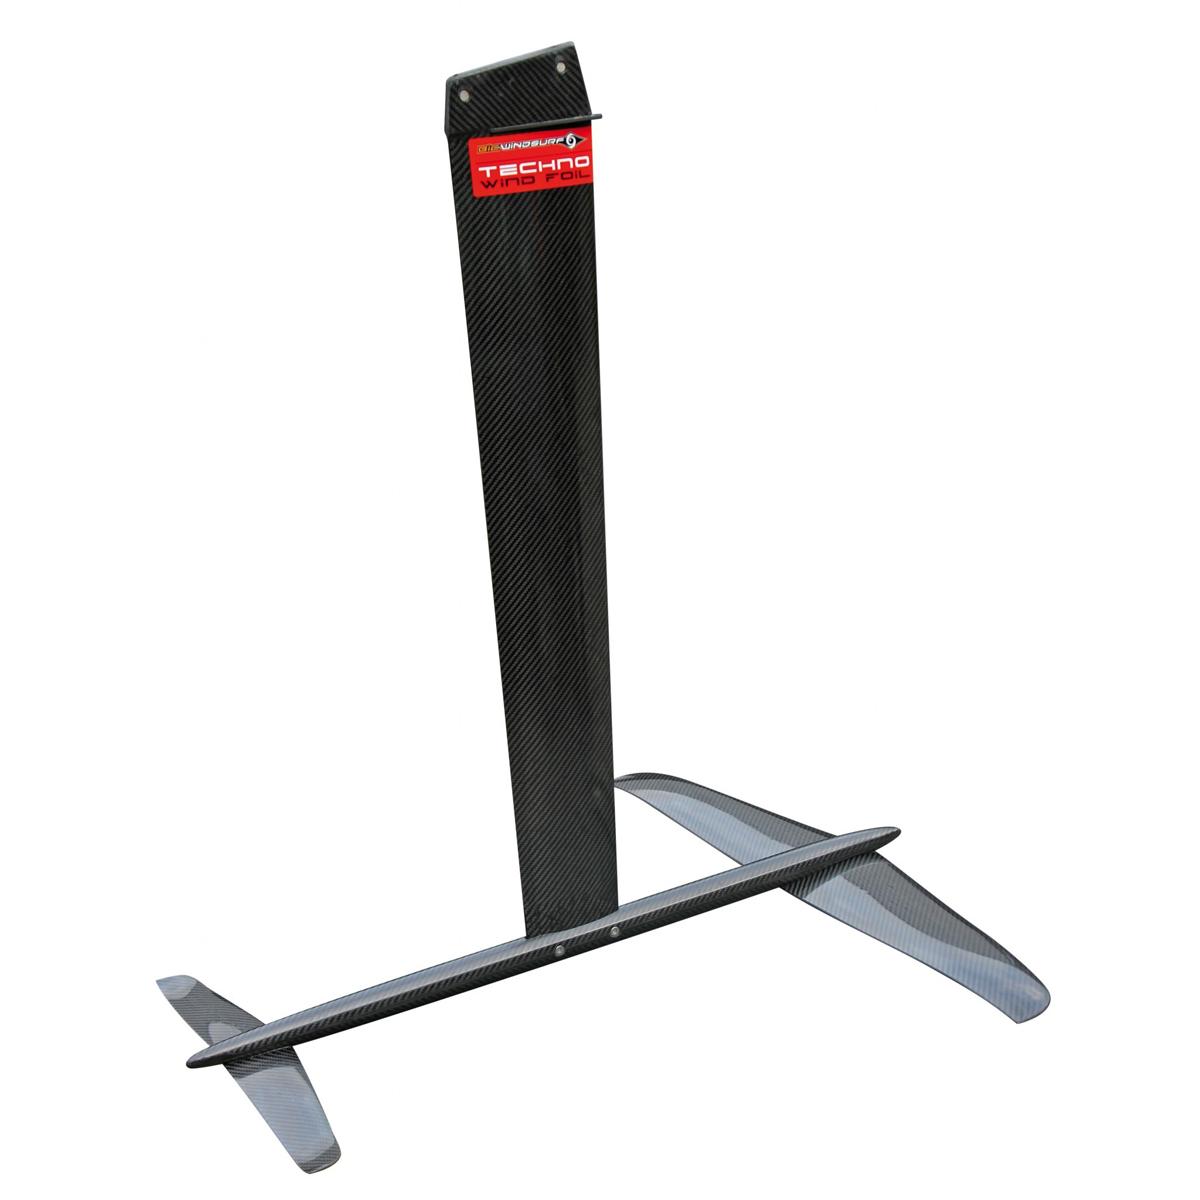 BicSurf---Techno-Windfoil-Board-and-Hydrofoil-Complete_126472C.jpg